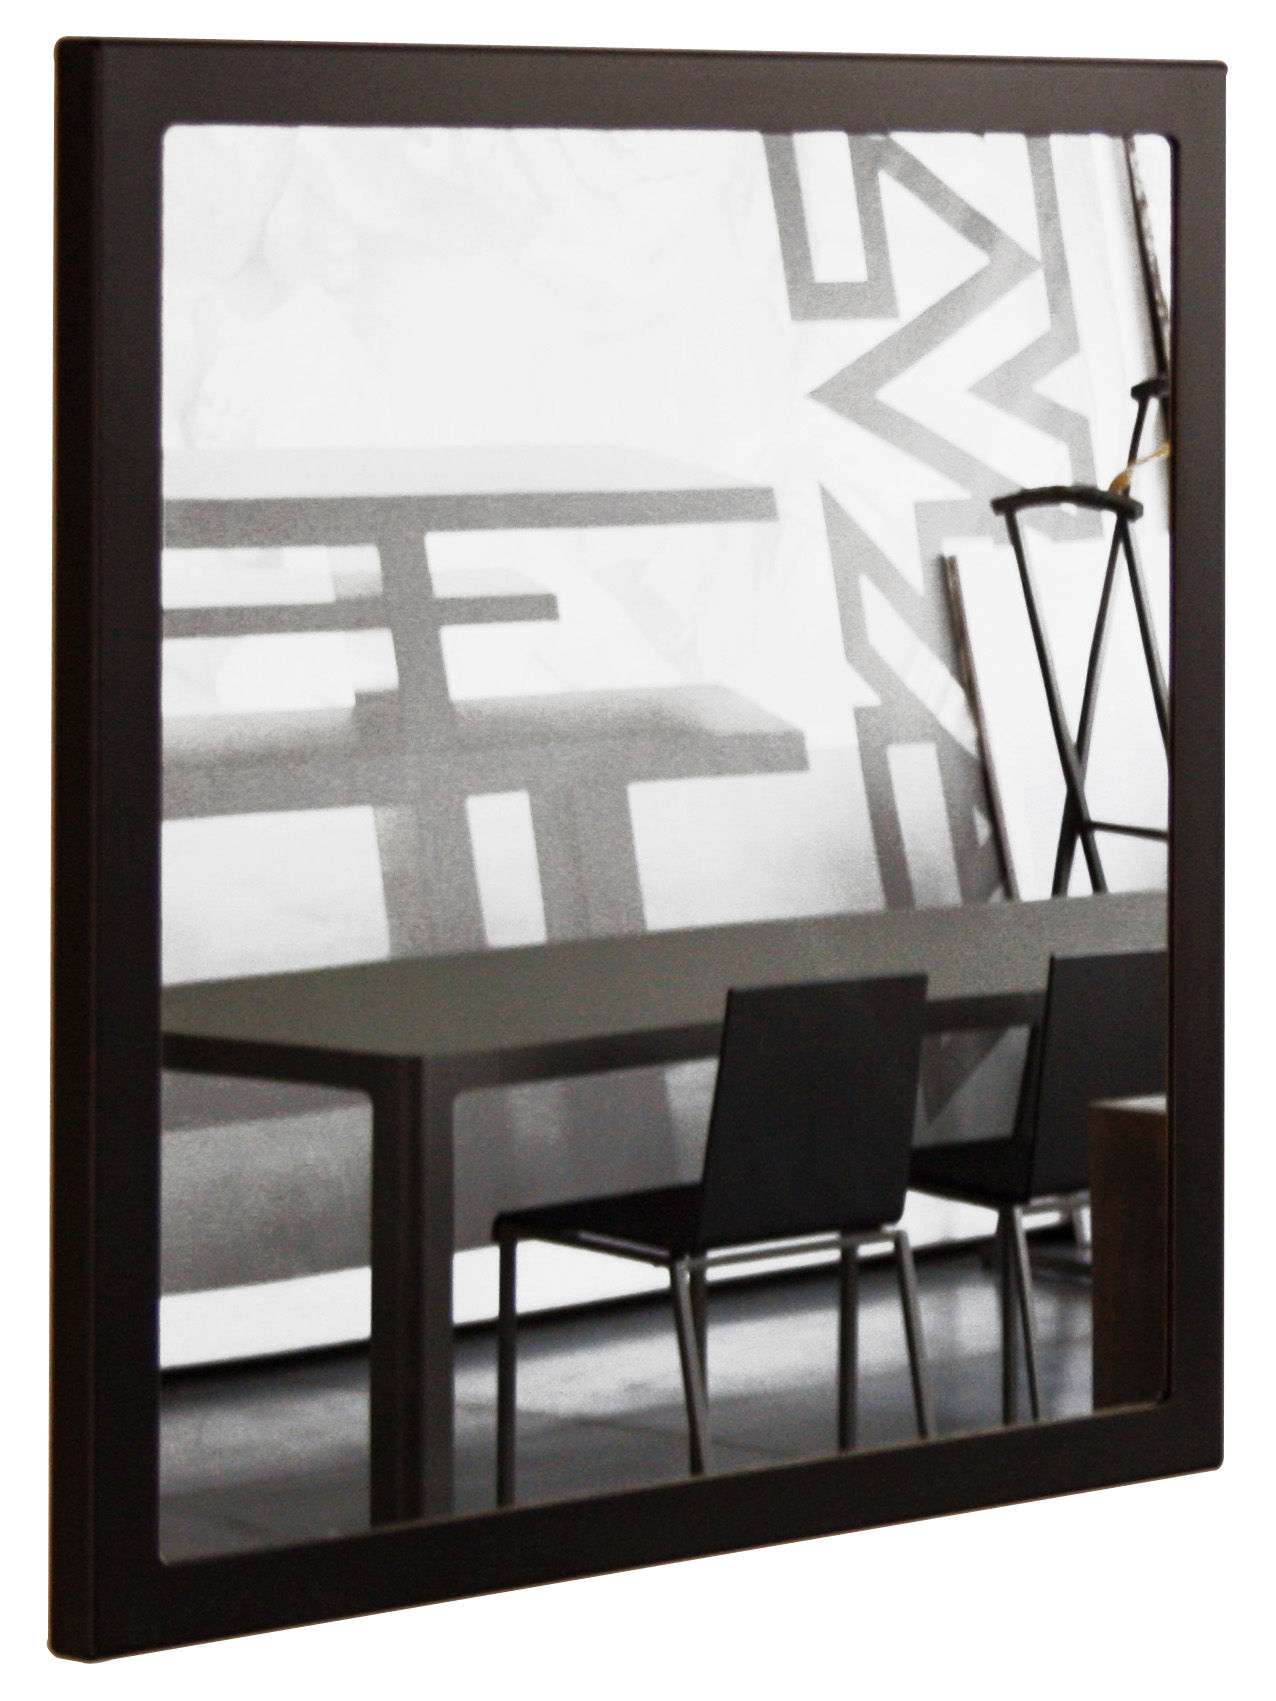 Little frame mirror 90 x 90 cm black phosphatized by zeus for Miroir 90x90